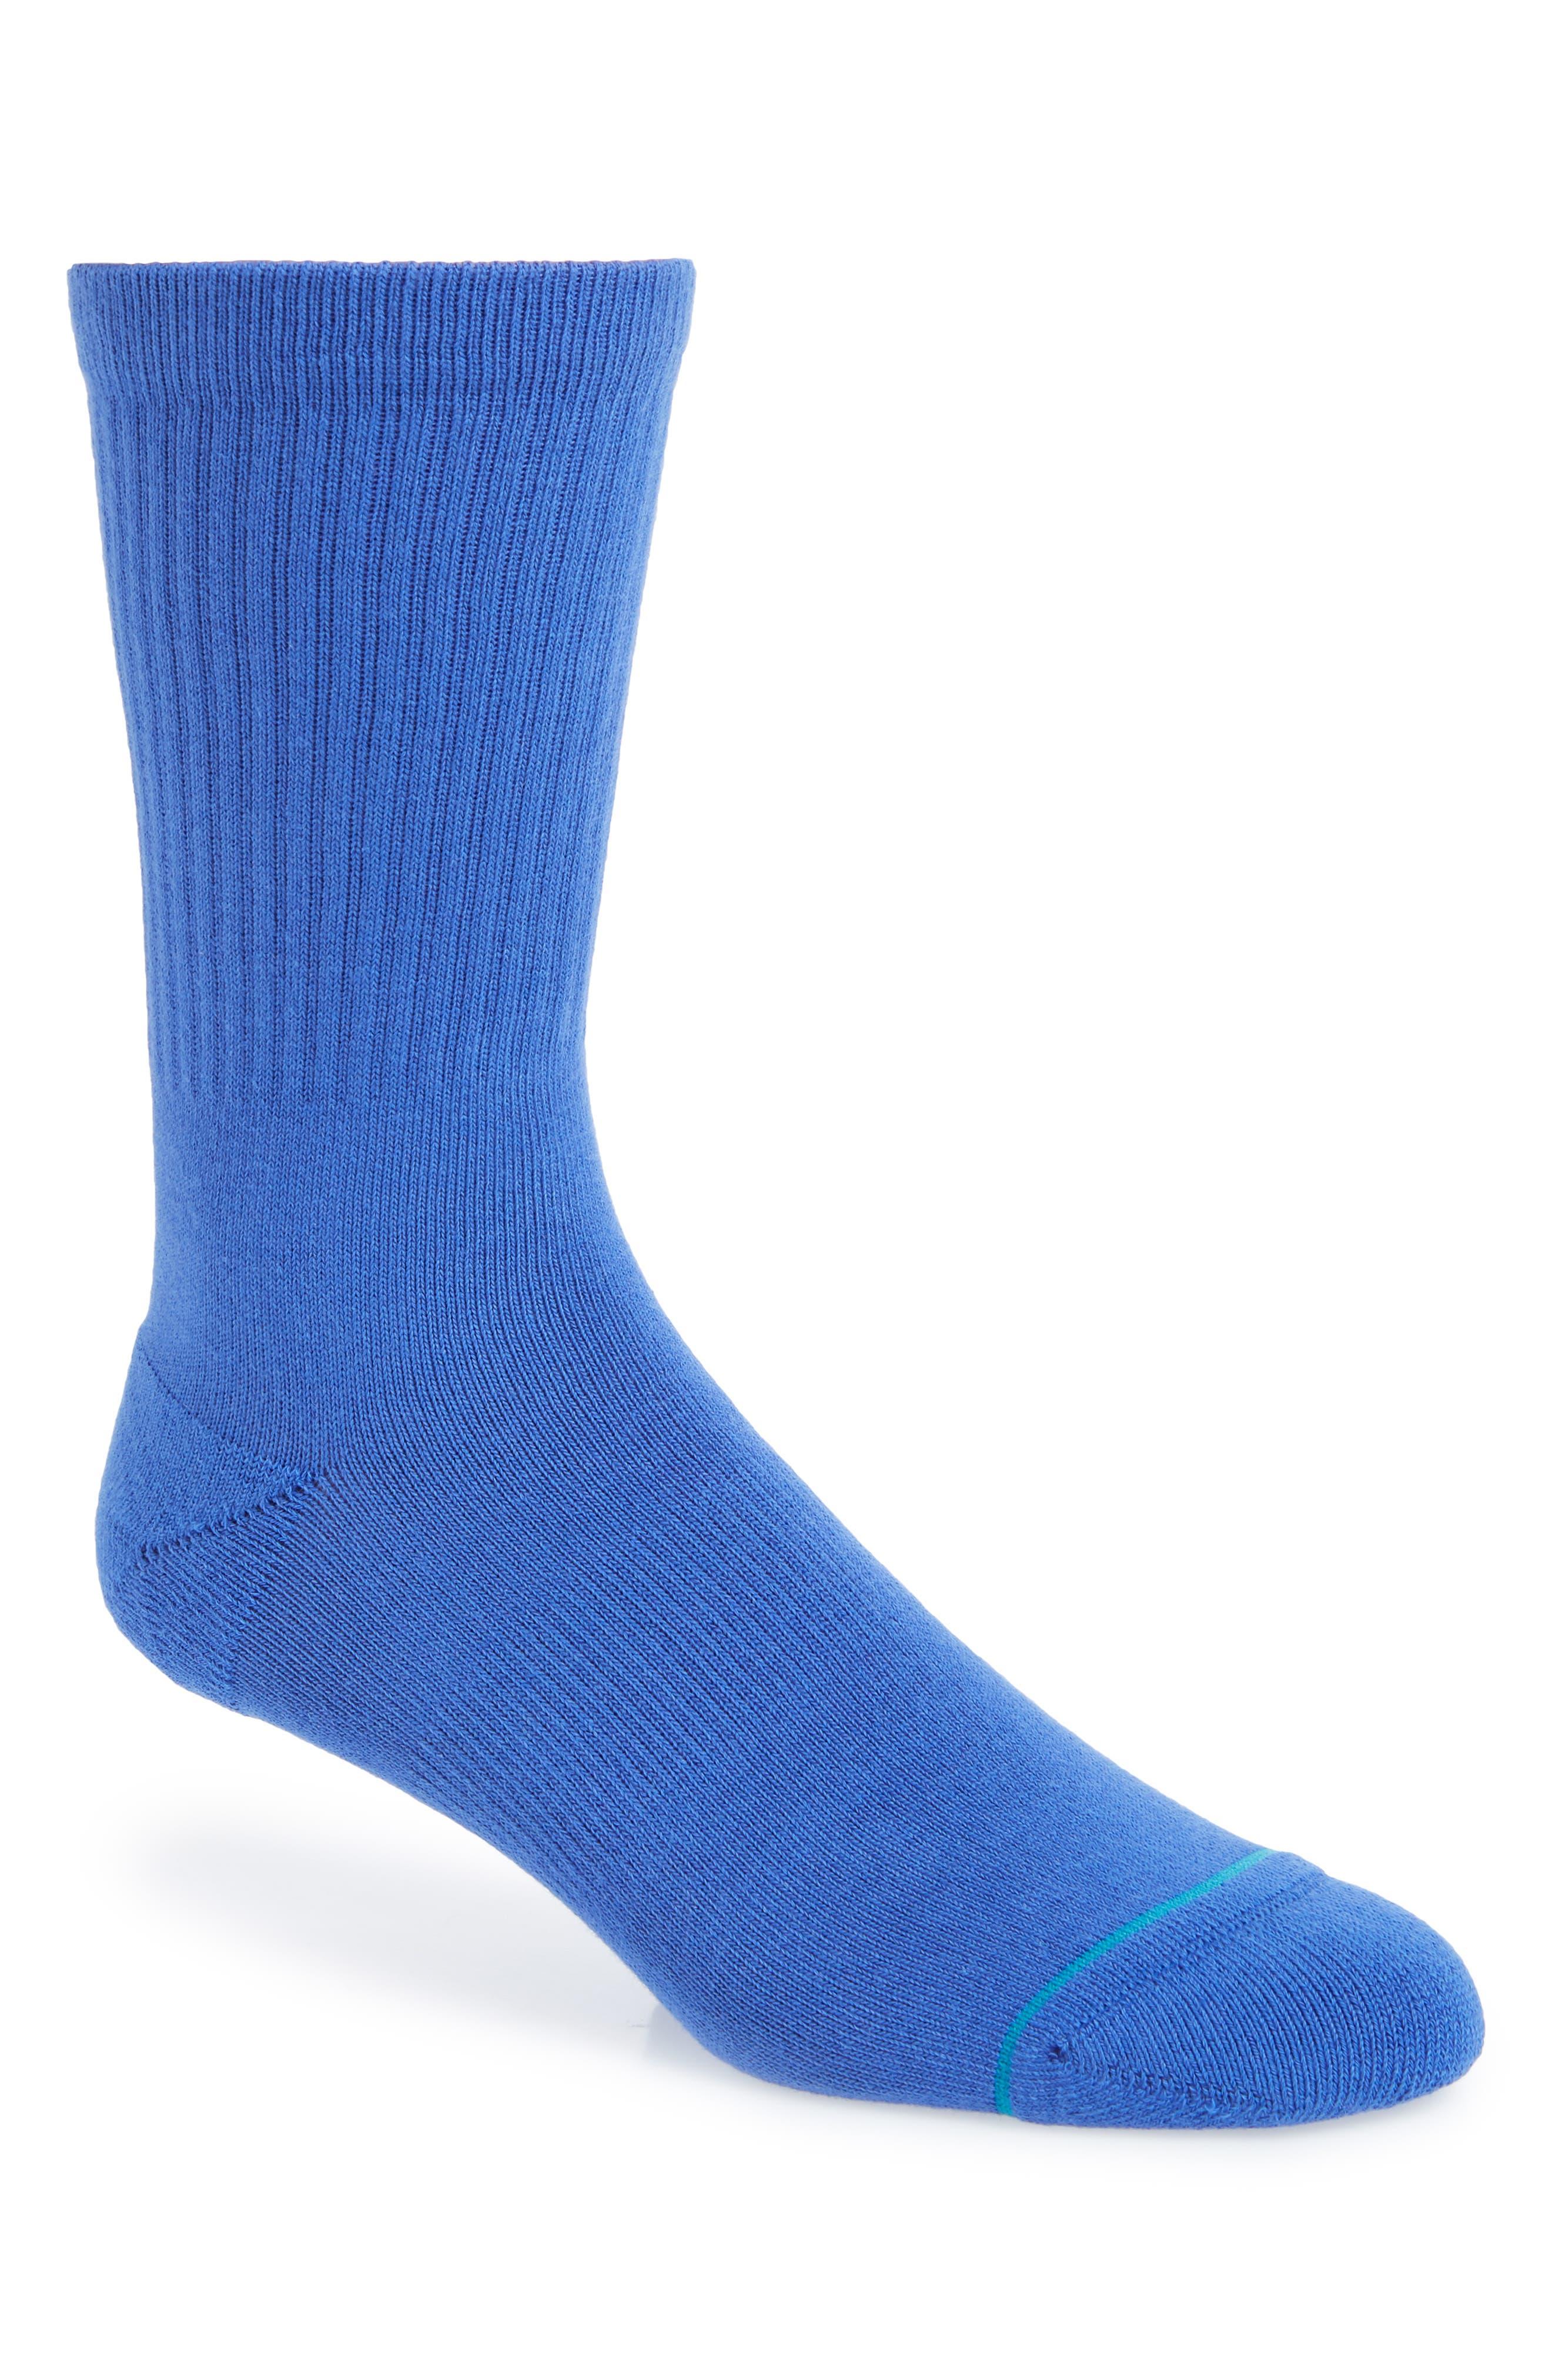 'Icon' Athletic Socks,                         Main,                         color, ROYAL